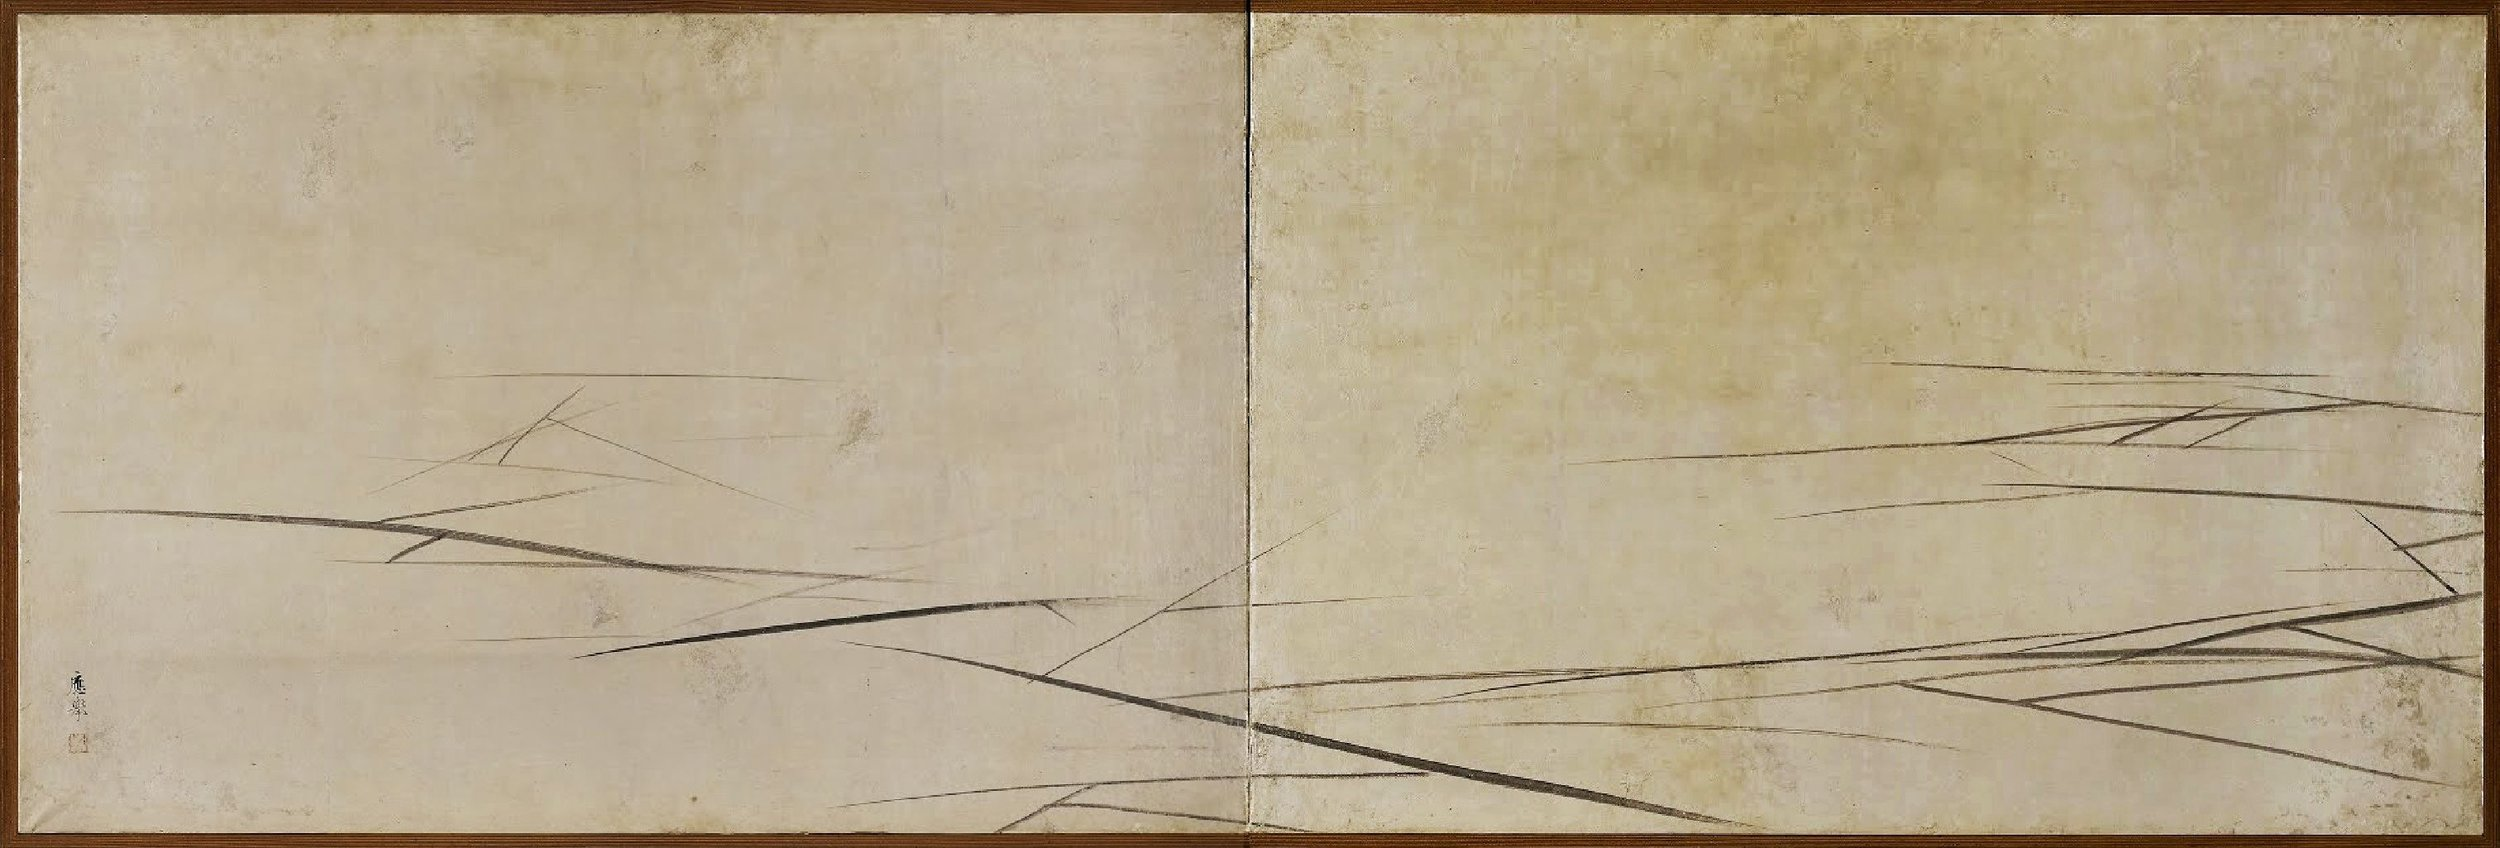 Fig. 5.  Cracked Ice  (1766)